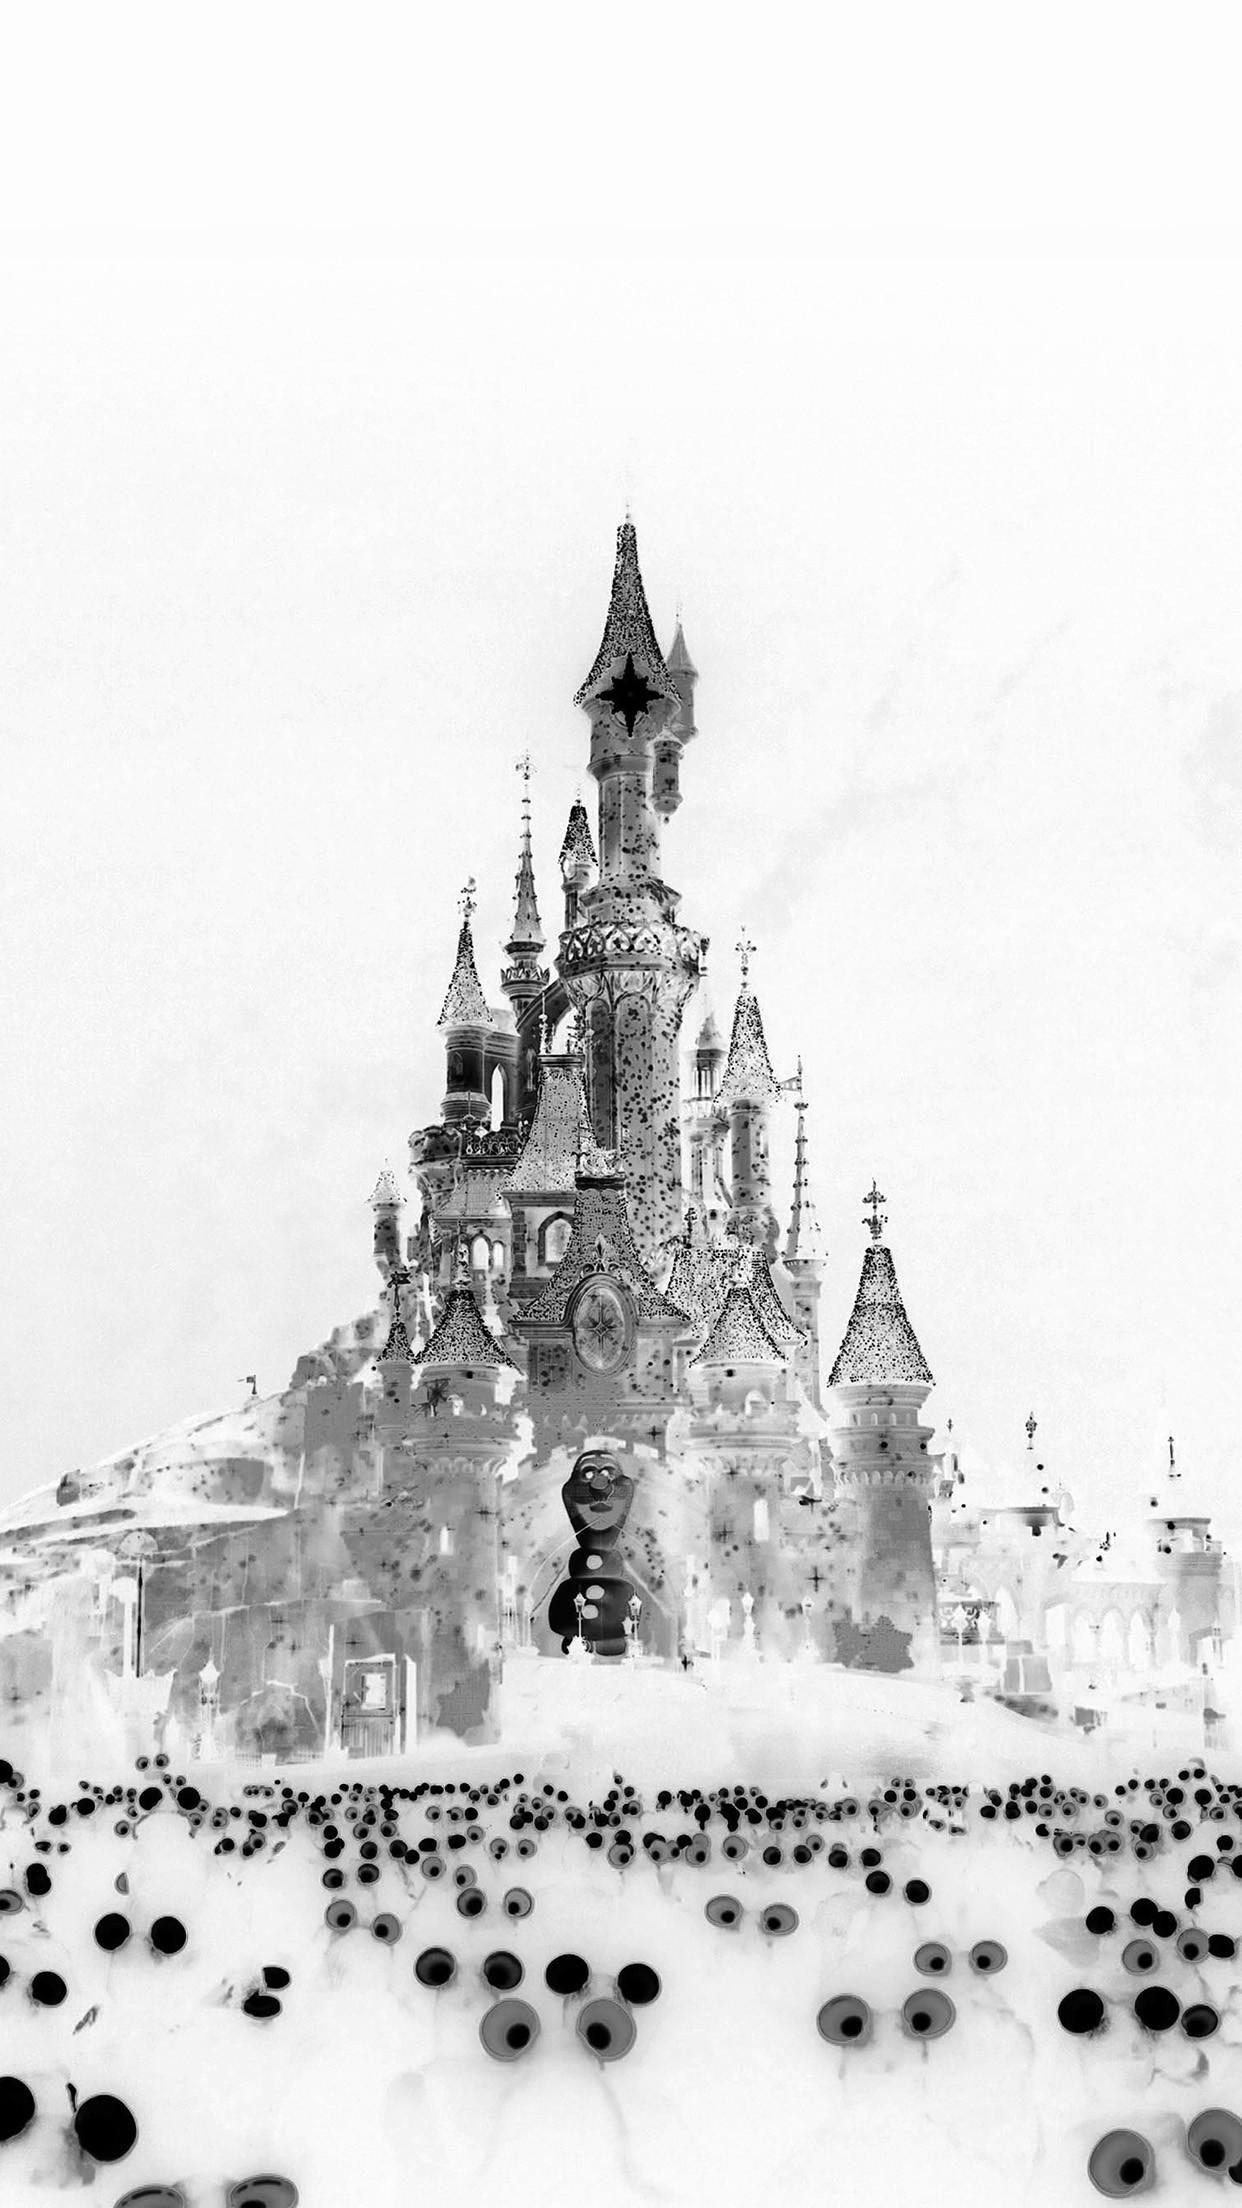 Disney Wallpaper (80+ images)